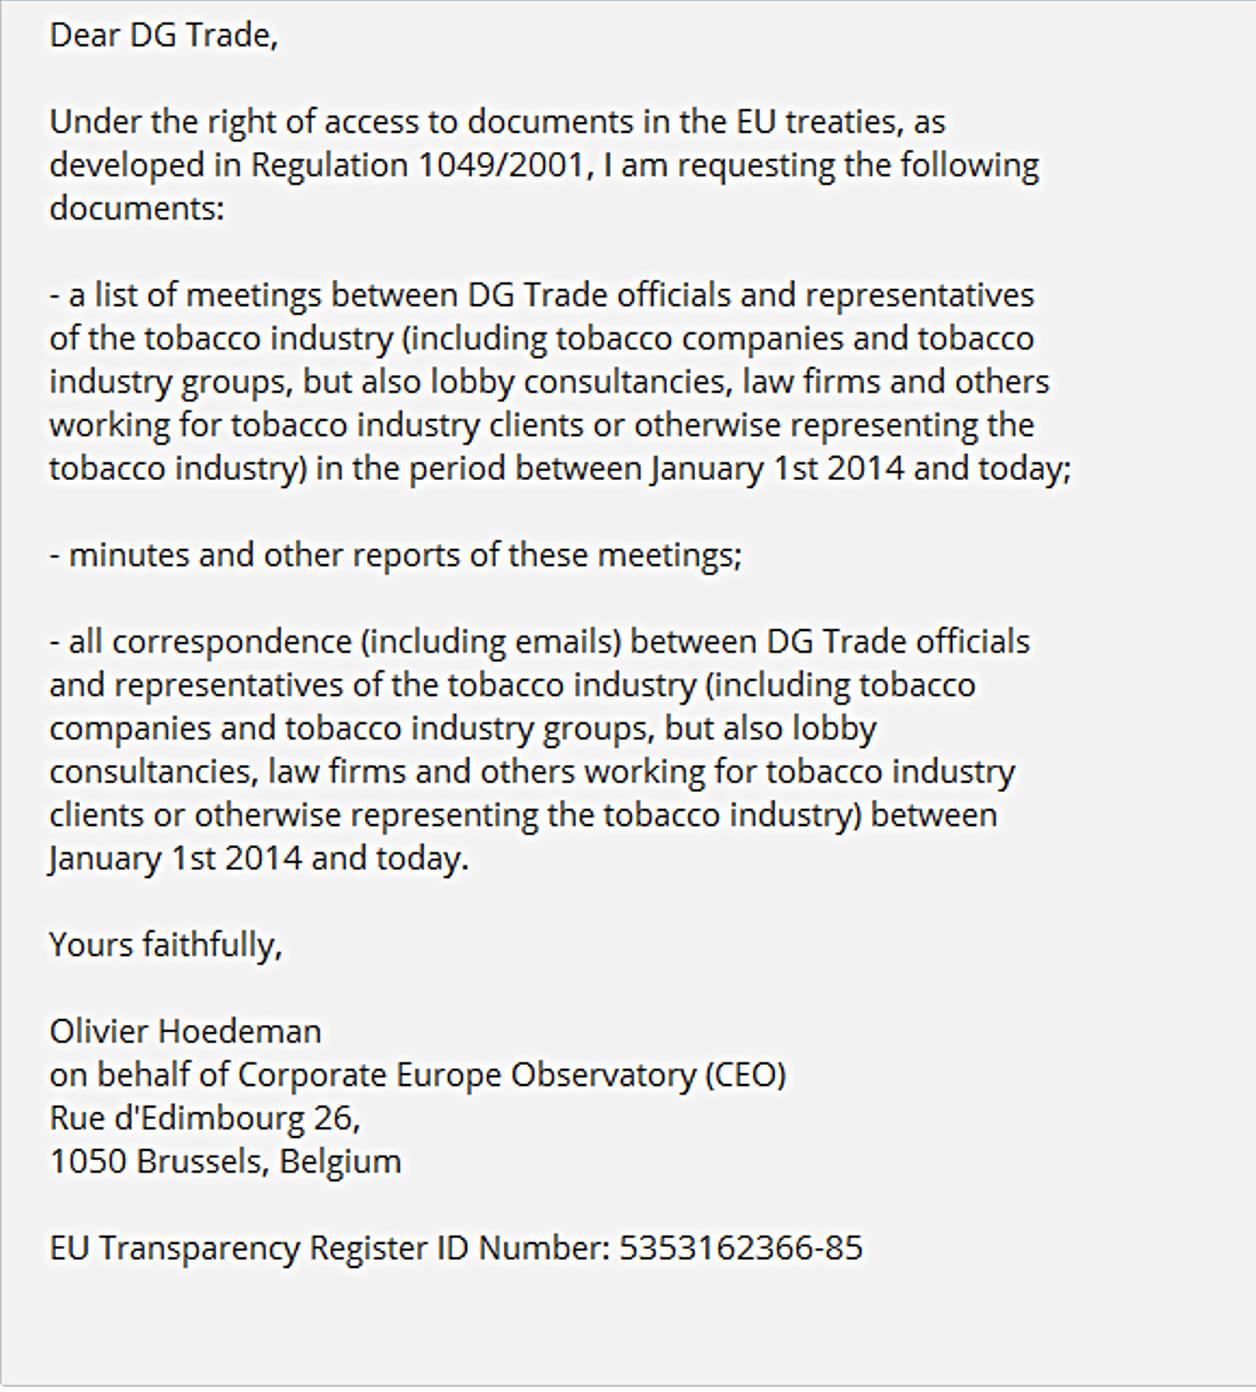 Anfrage an die EU-Kommission